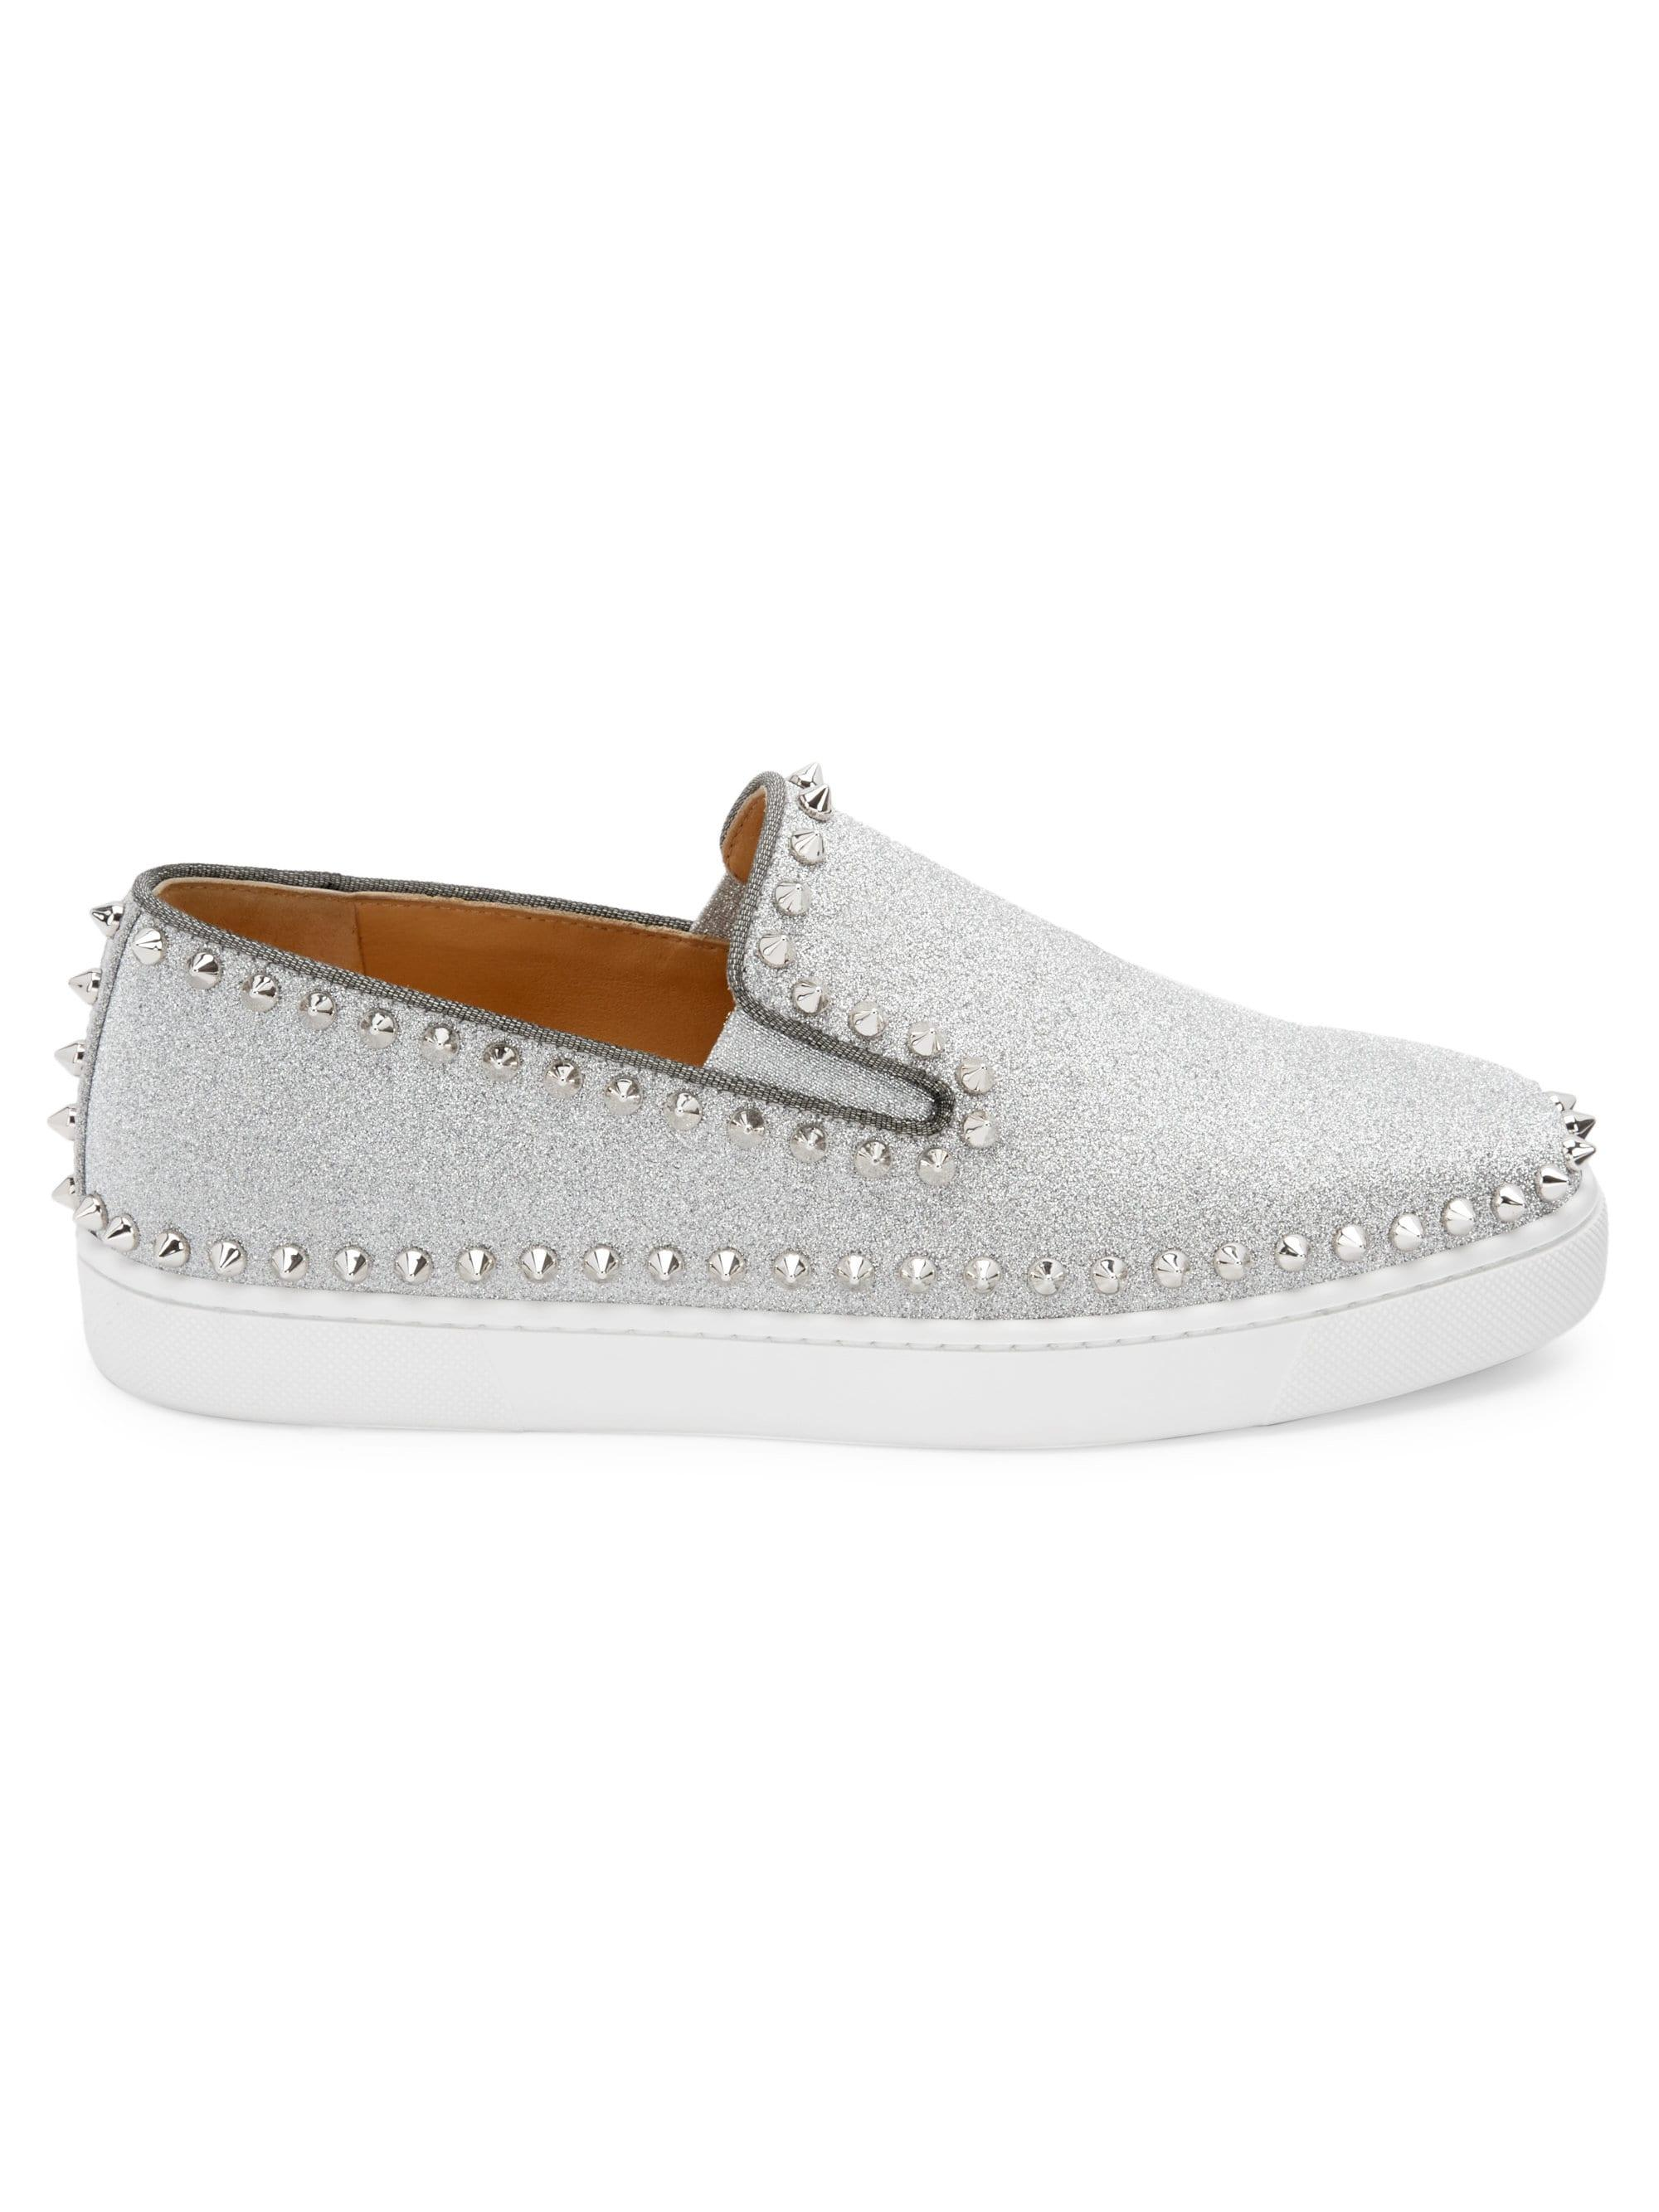 271cec03acff Lyst - Christian Louboutin Pik Glitter Boat Shoes in Metallic